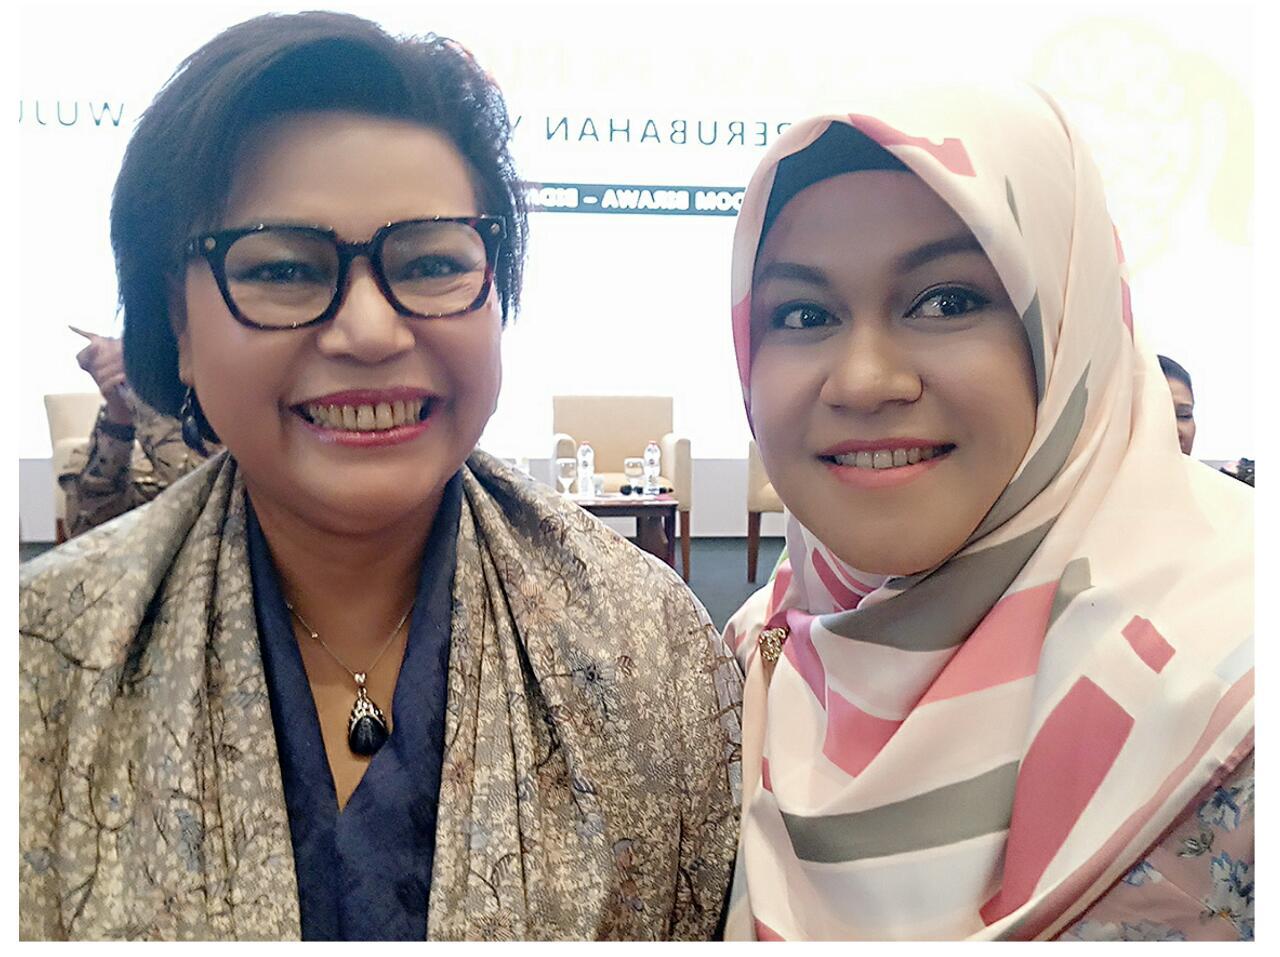 Peringatan Hakordia, Aktivis HMPI Dukung KPK Basmi Korupsi